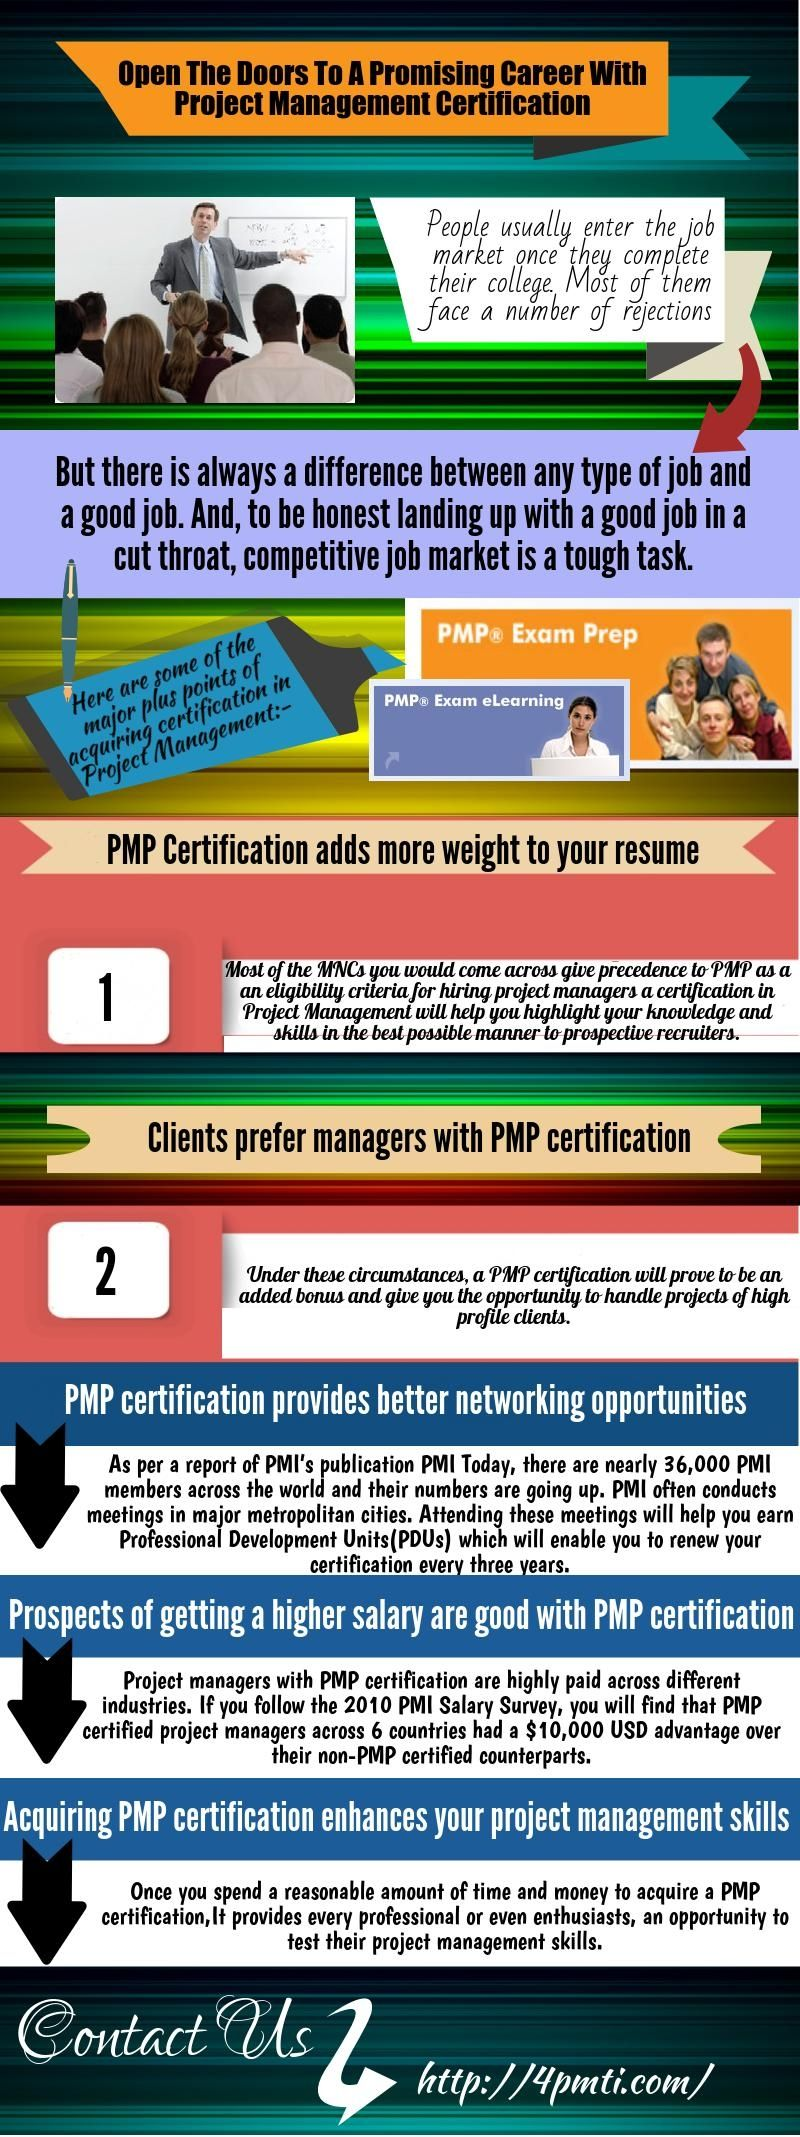 Acquiring Pmp Certification Enhances Your Project Management Skills